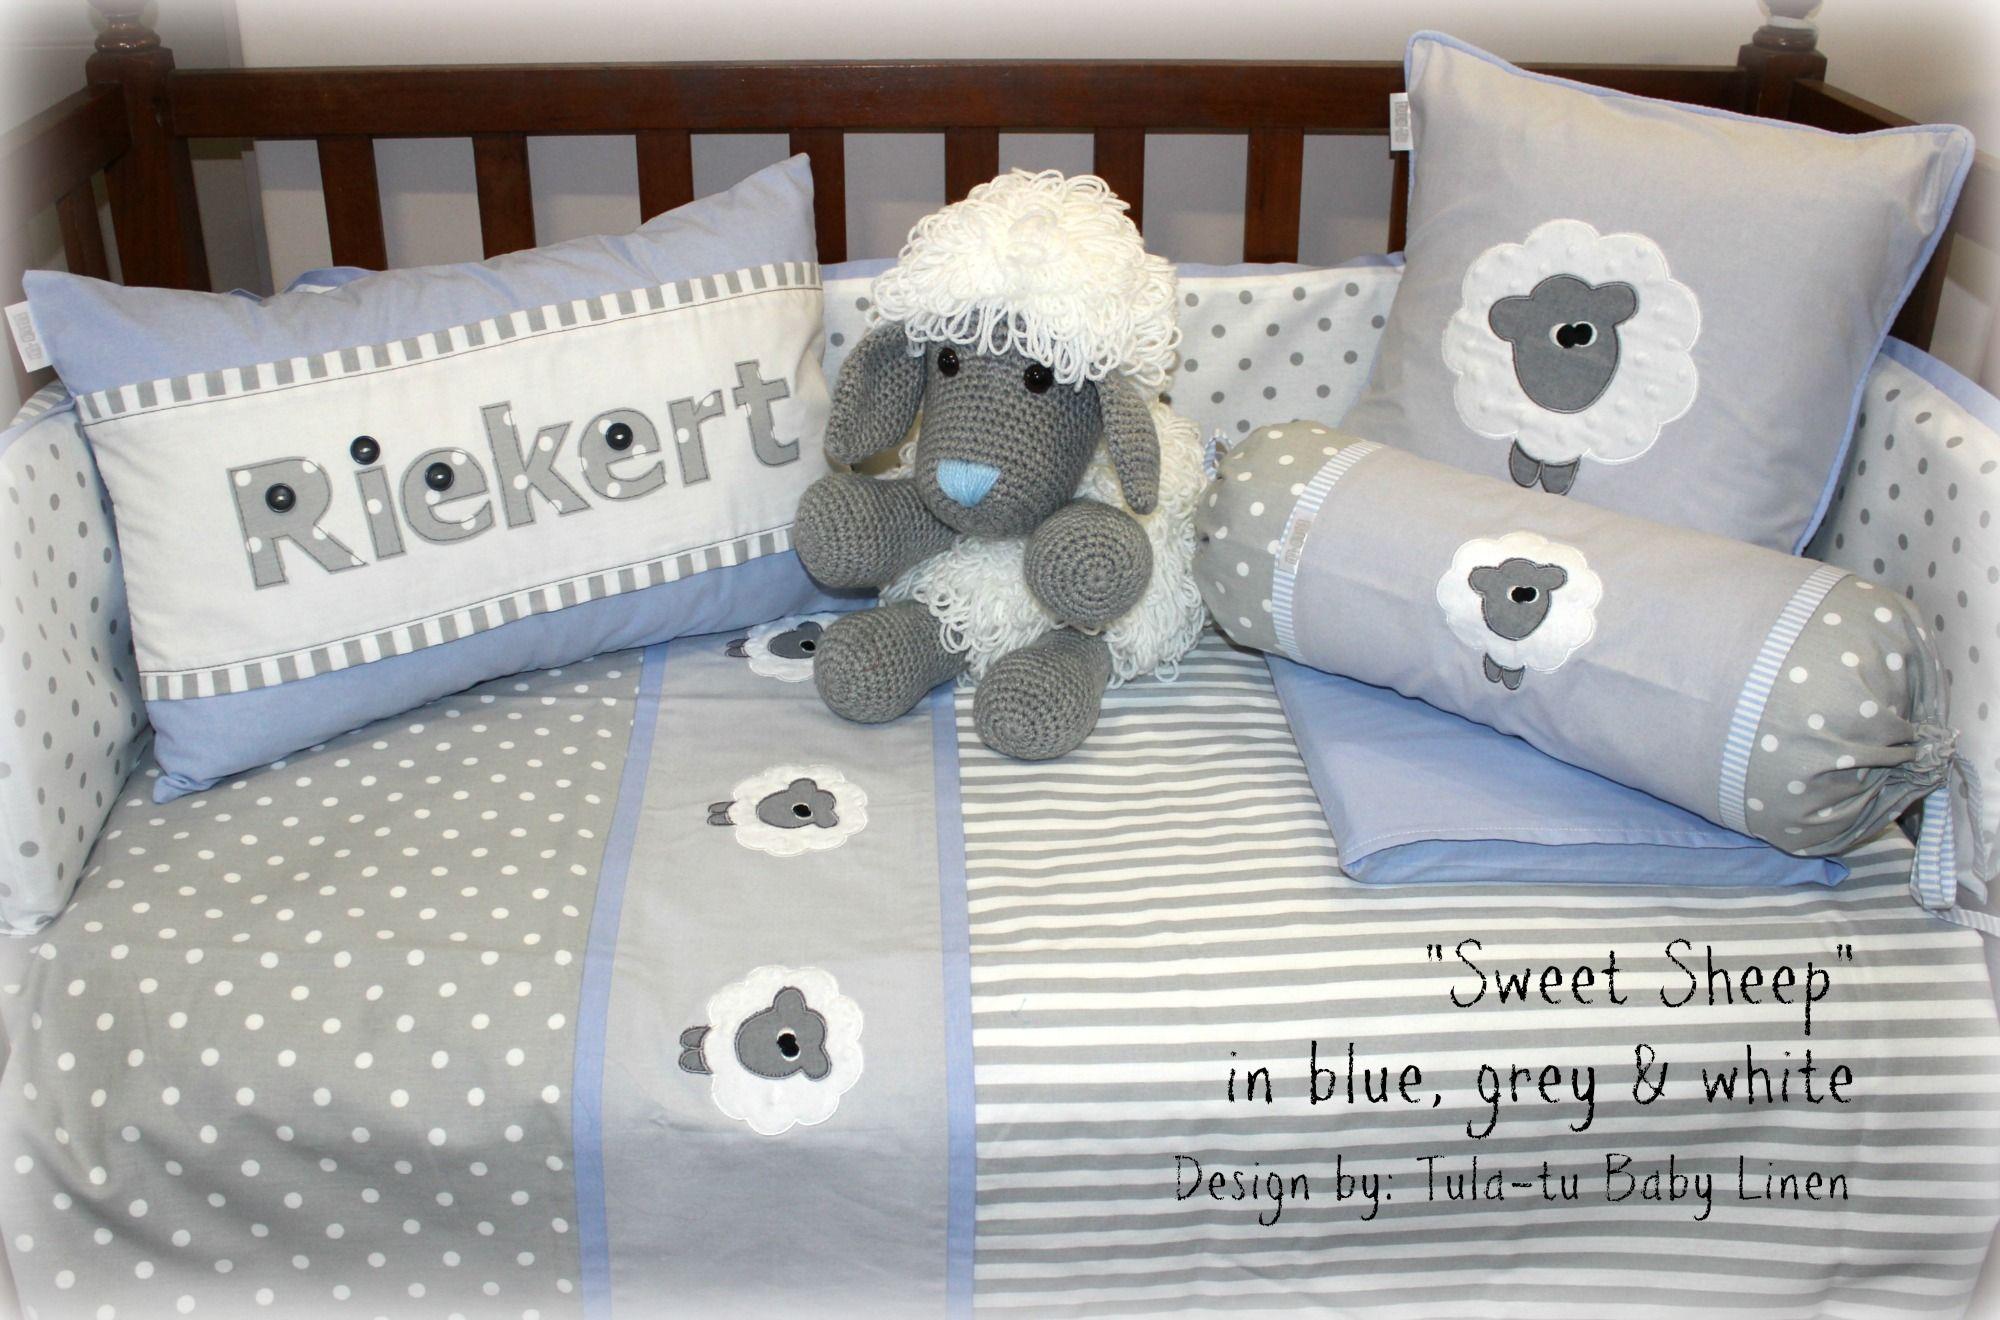 Sweet Sheep Nursery Linen In Grey White Light Blue Accents